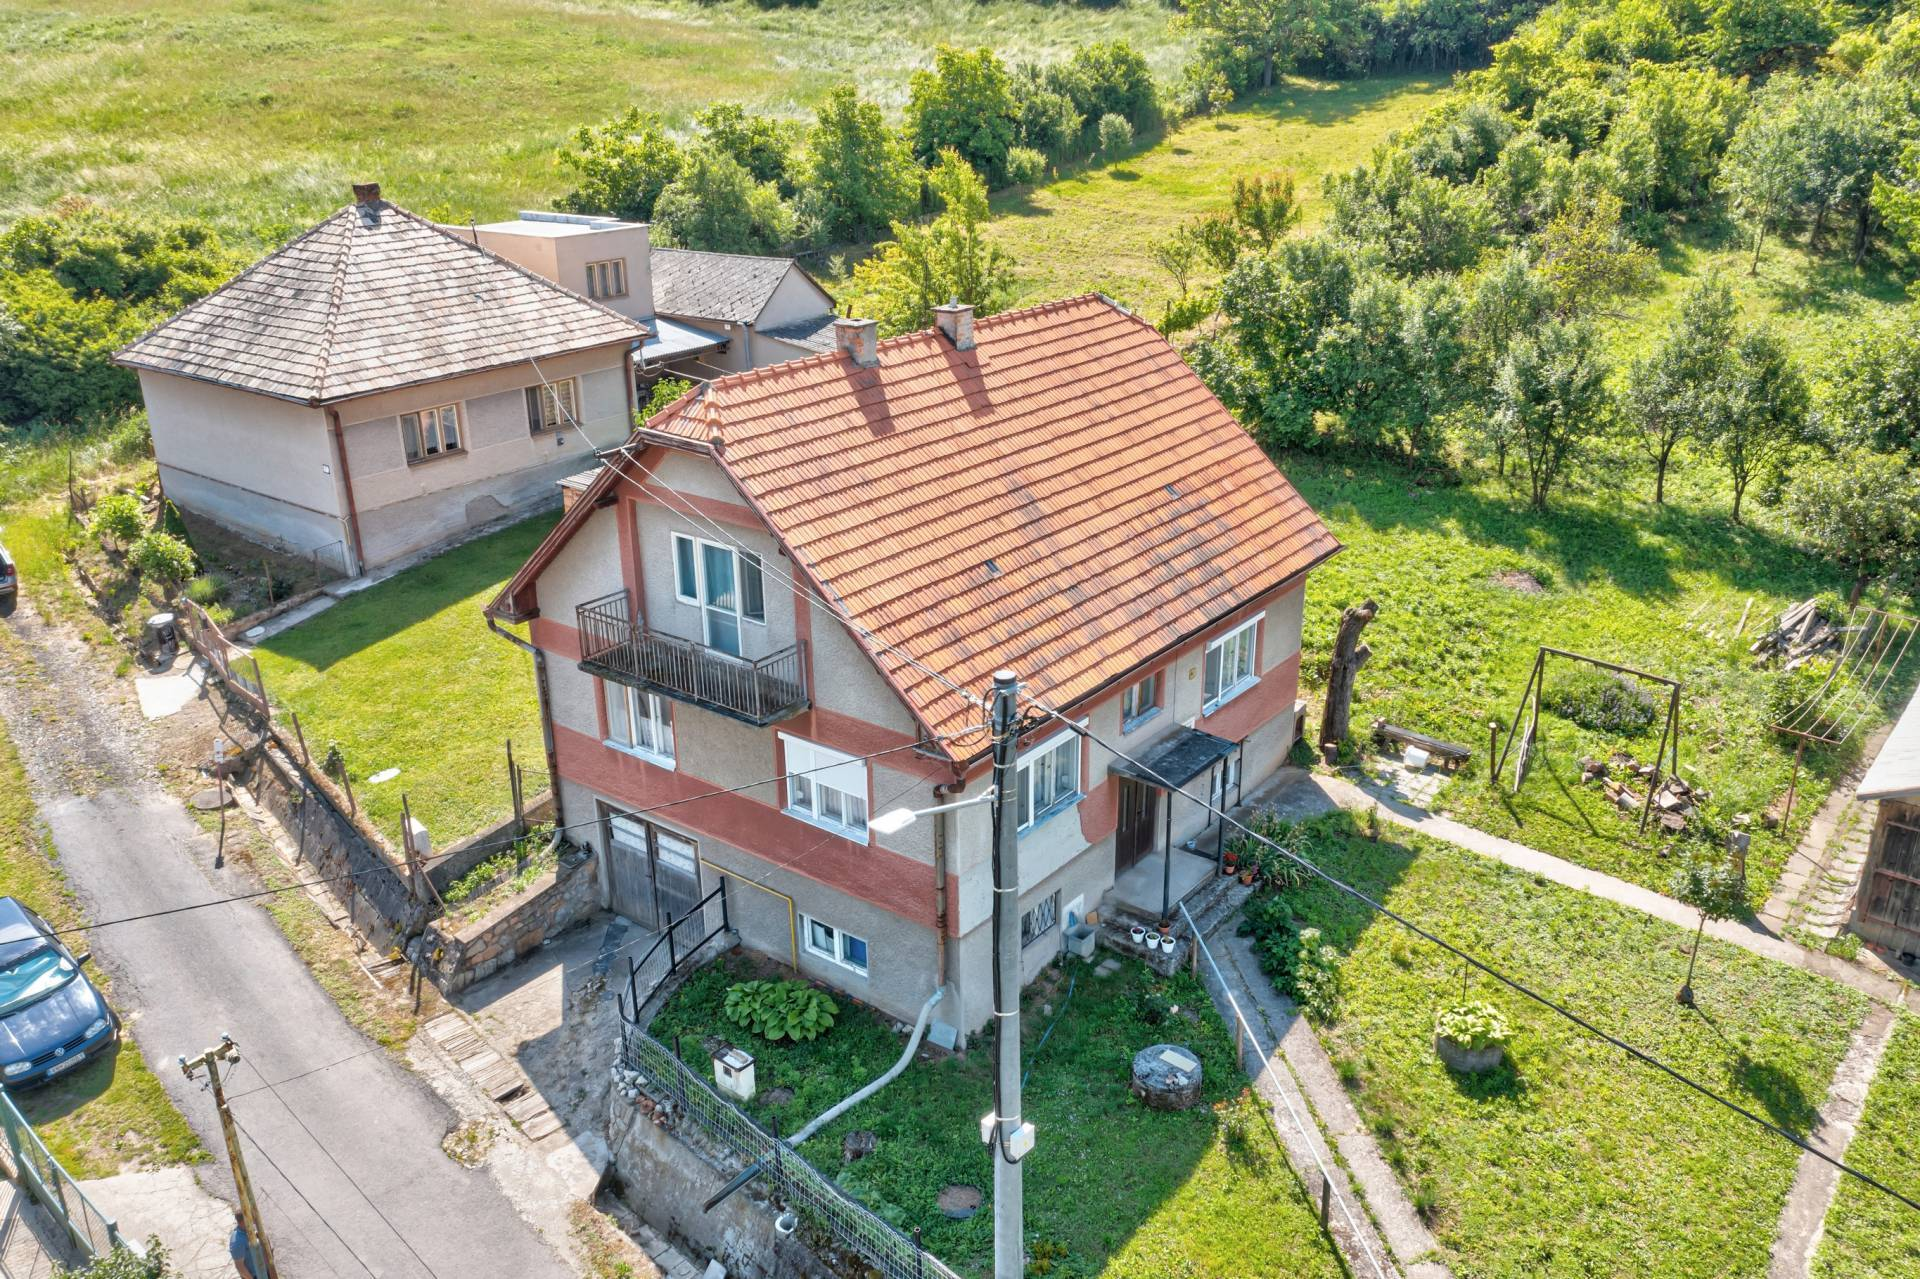 REZERVOVANÉ - Predaj rodinného domu 220m2, Opatovská Nová Ves